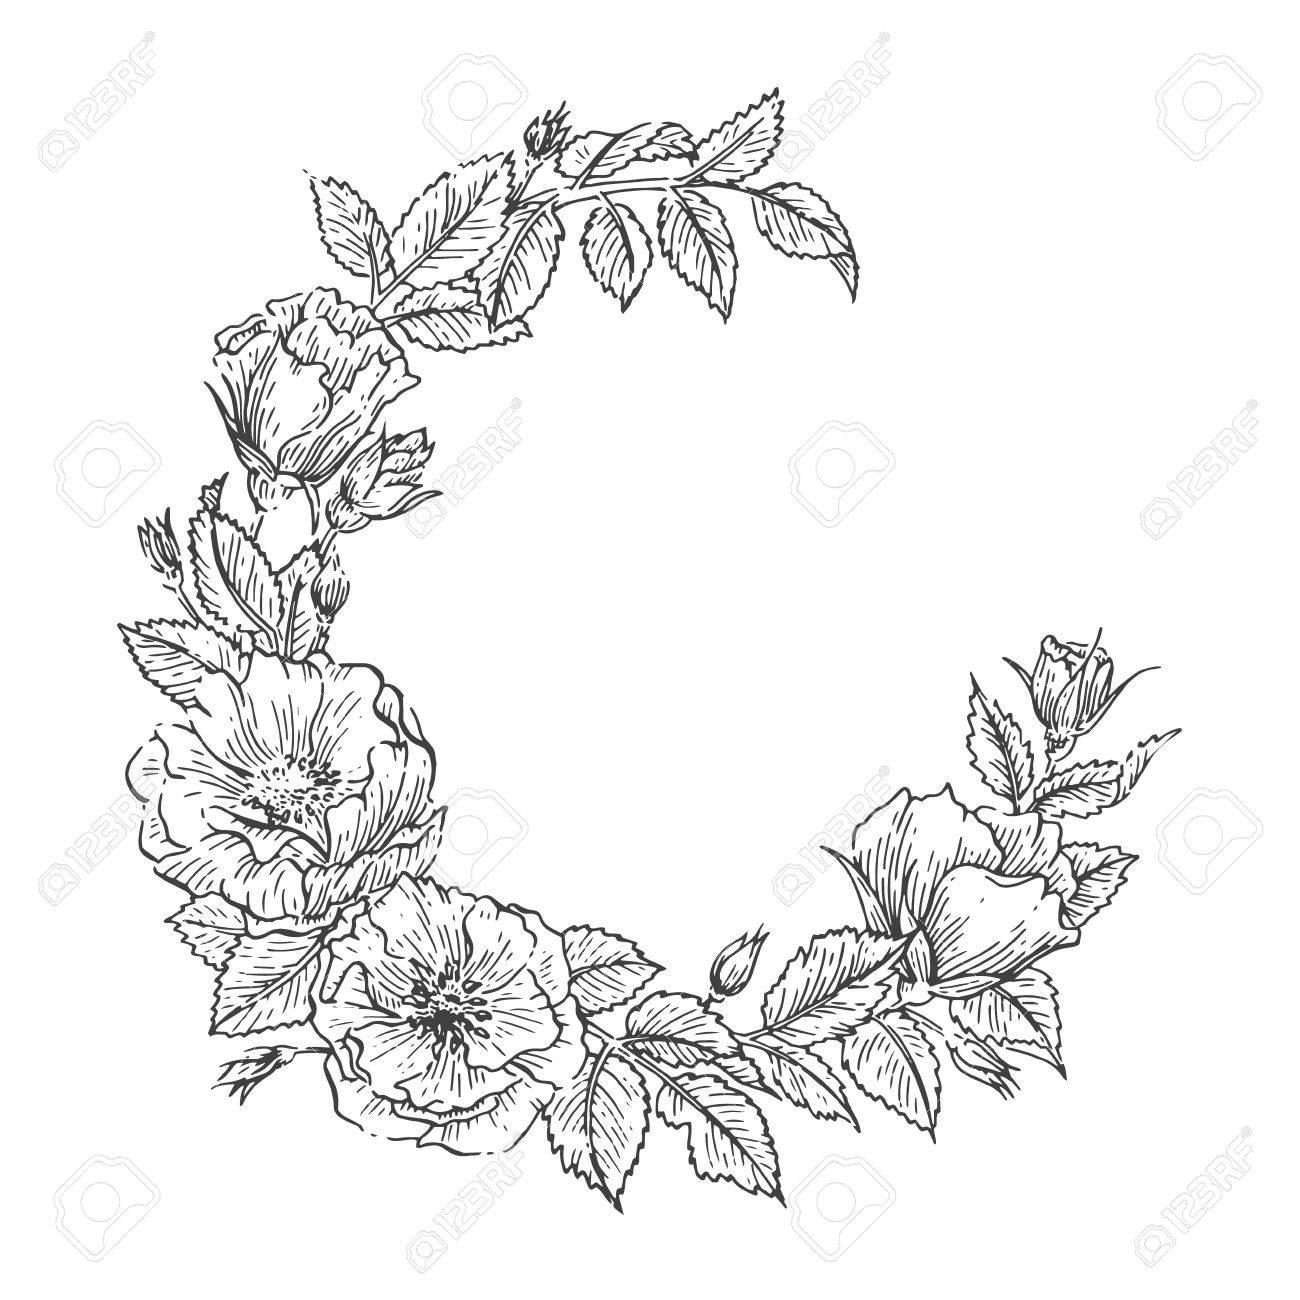 1300x1300 Hand Drawn Sketch Garden Floweral Wreath. Vector Greeting Card